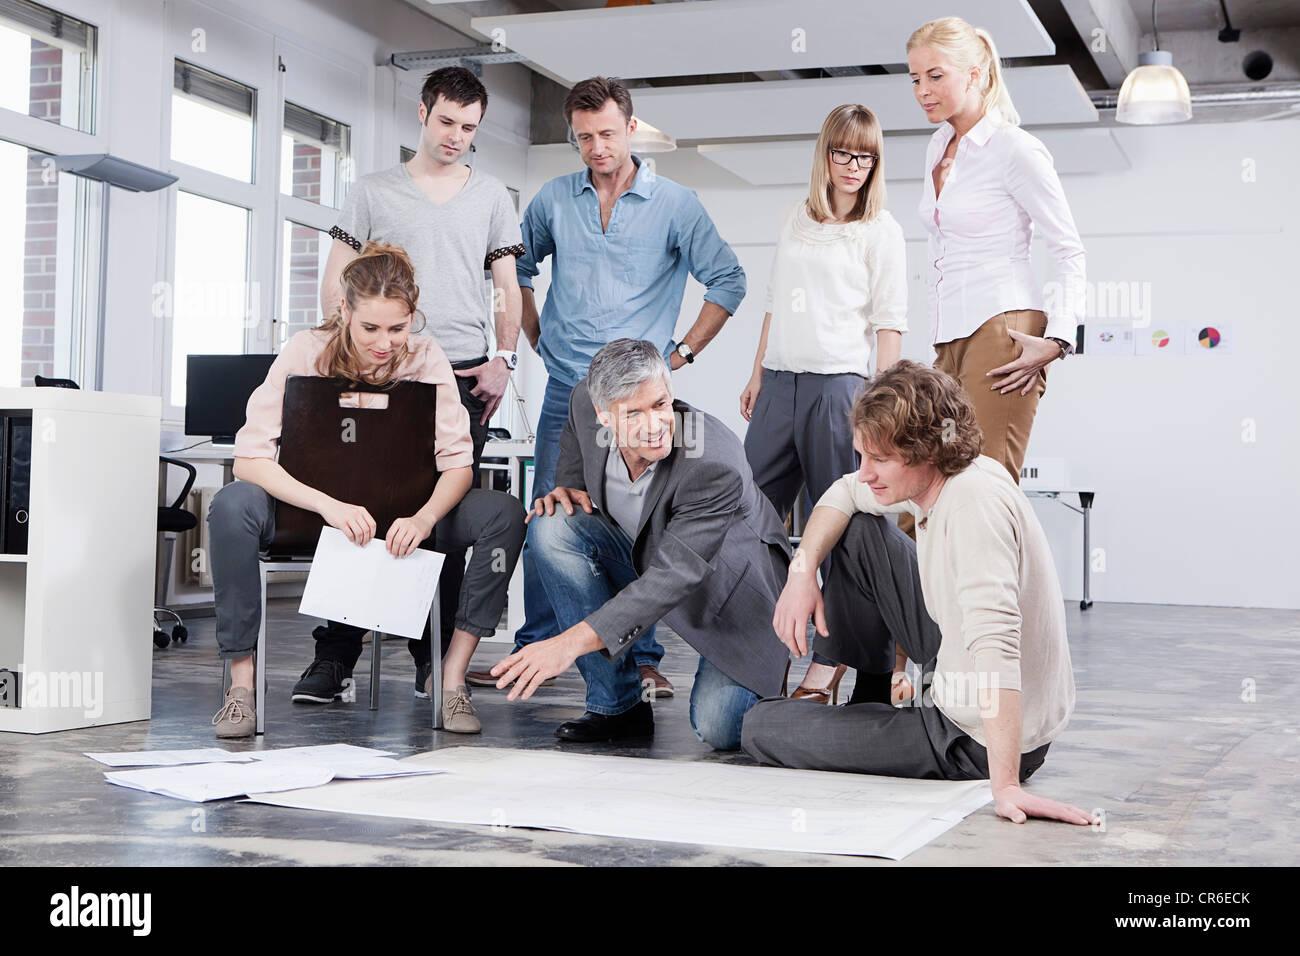 Germany, Bavaria, Munich, hommes et femmes discutant dans office Photo Stock